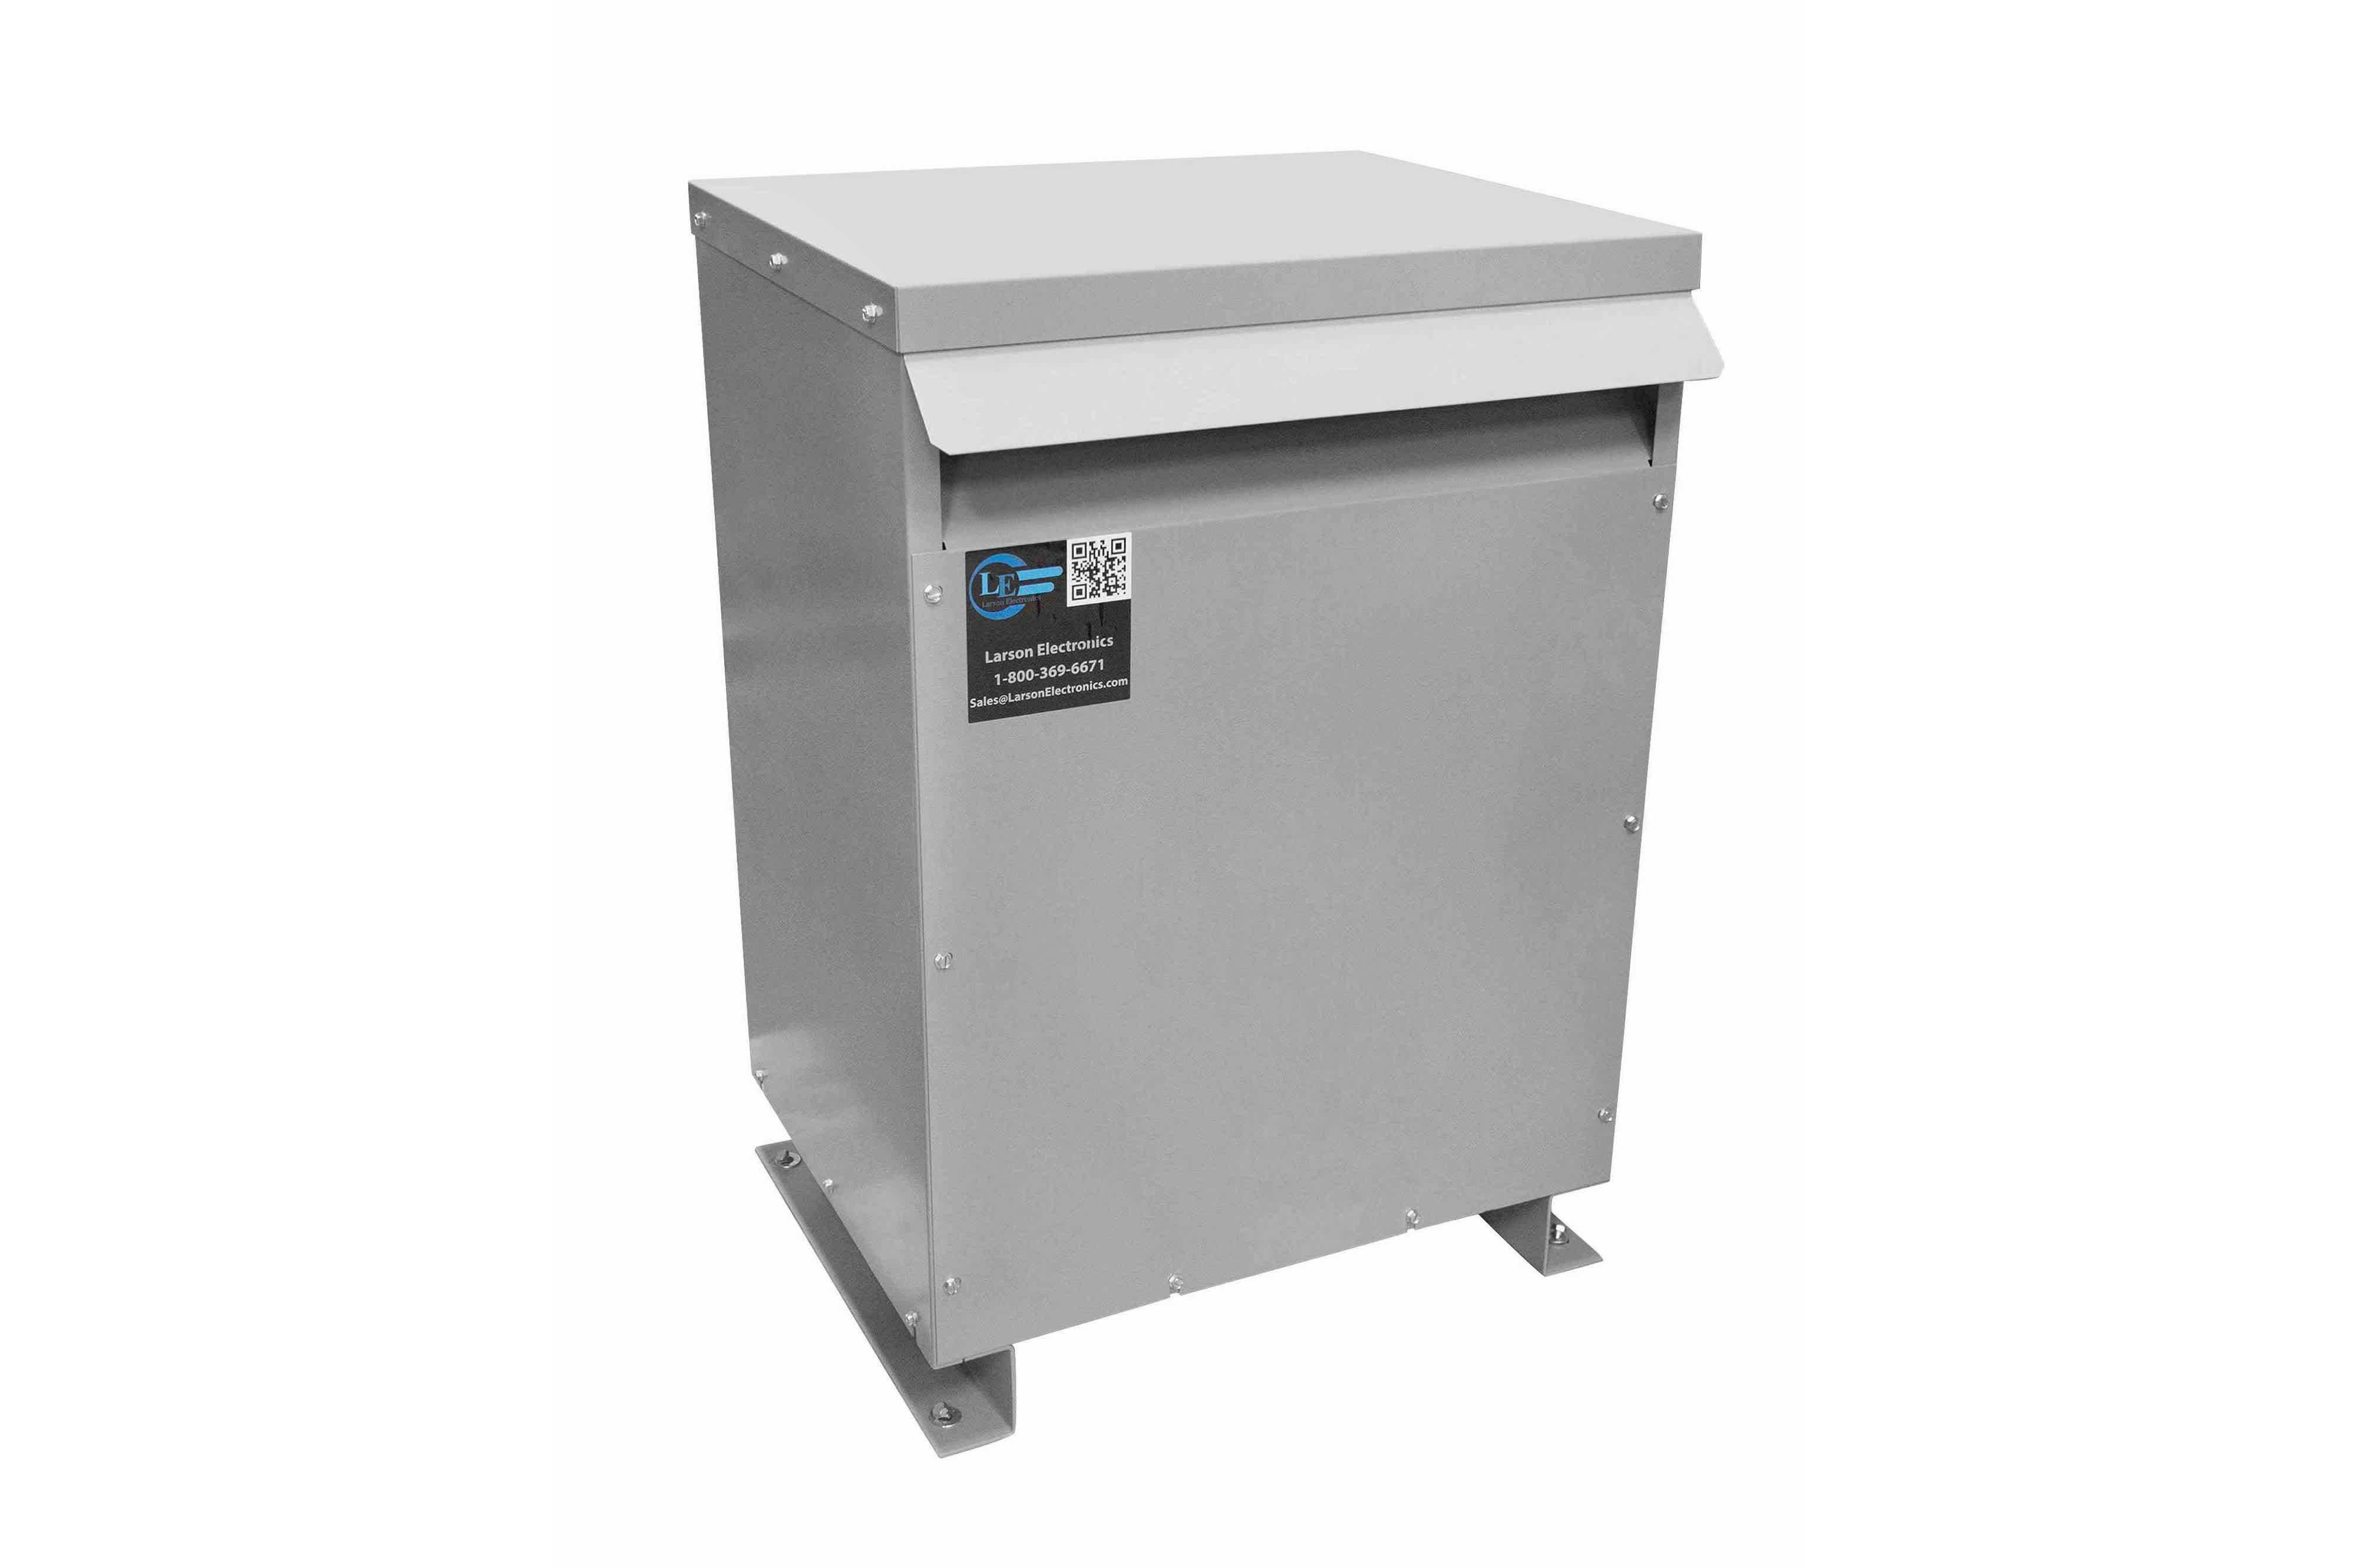 20 kVA 3PH Isolation Transformer, 230V Wye Primary, 480Y/277 Wye-N Secondary, N3R, Ventilated, 60 Hz